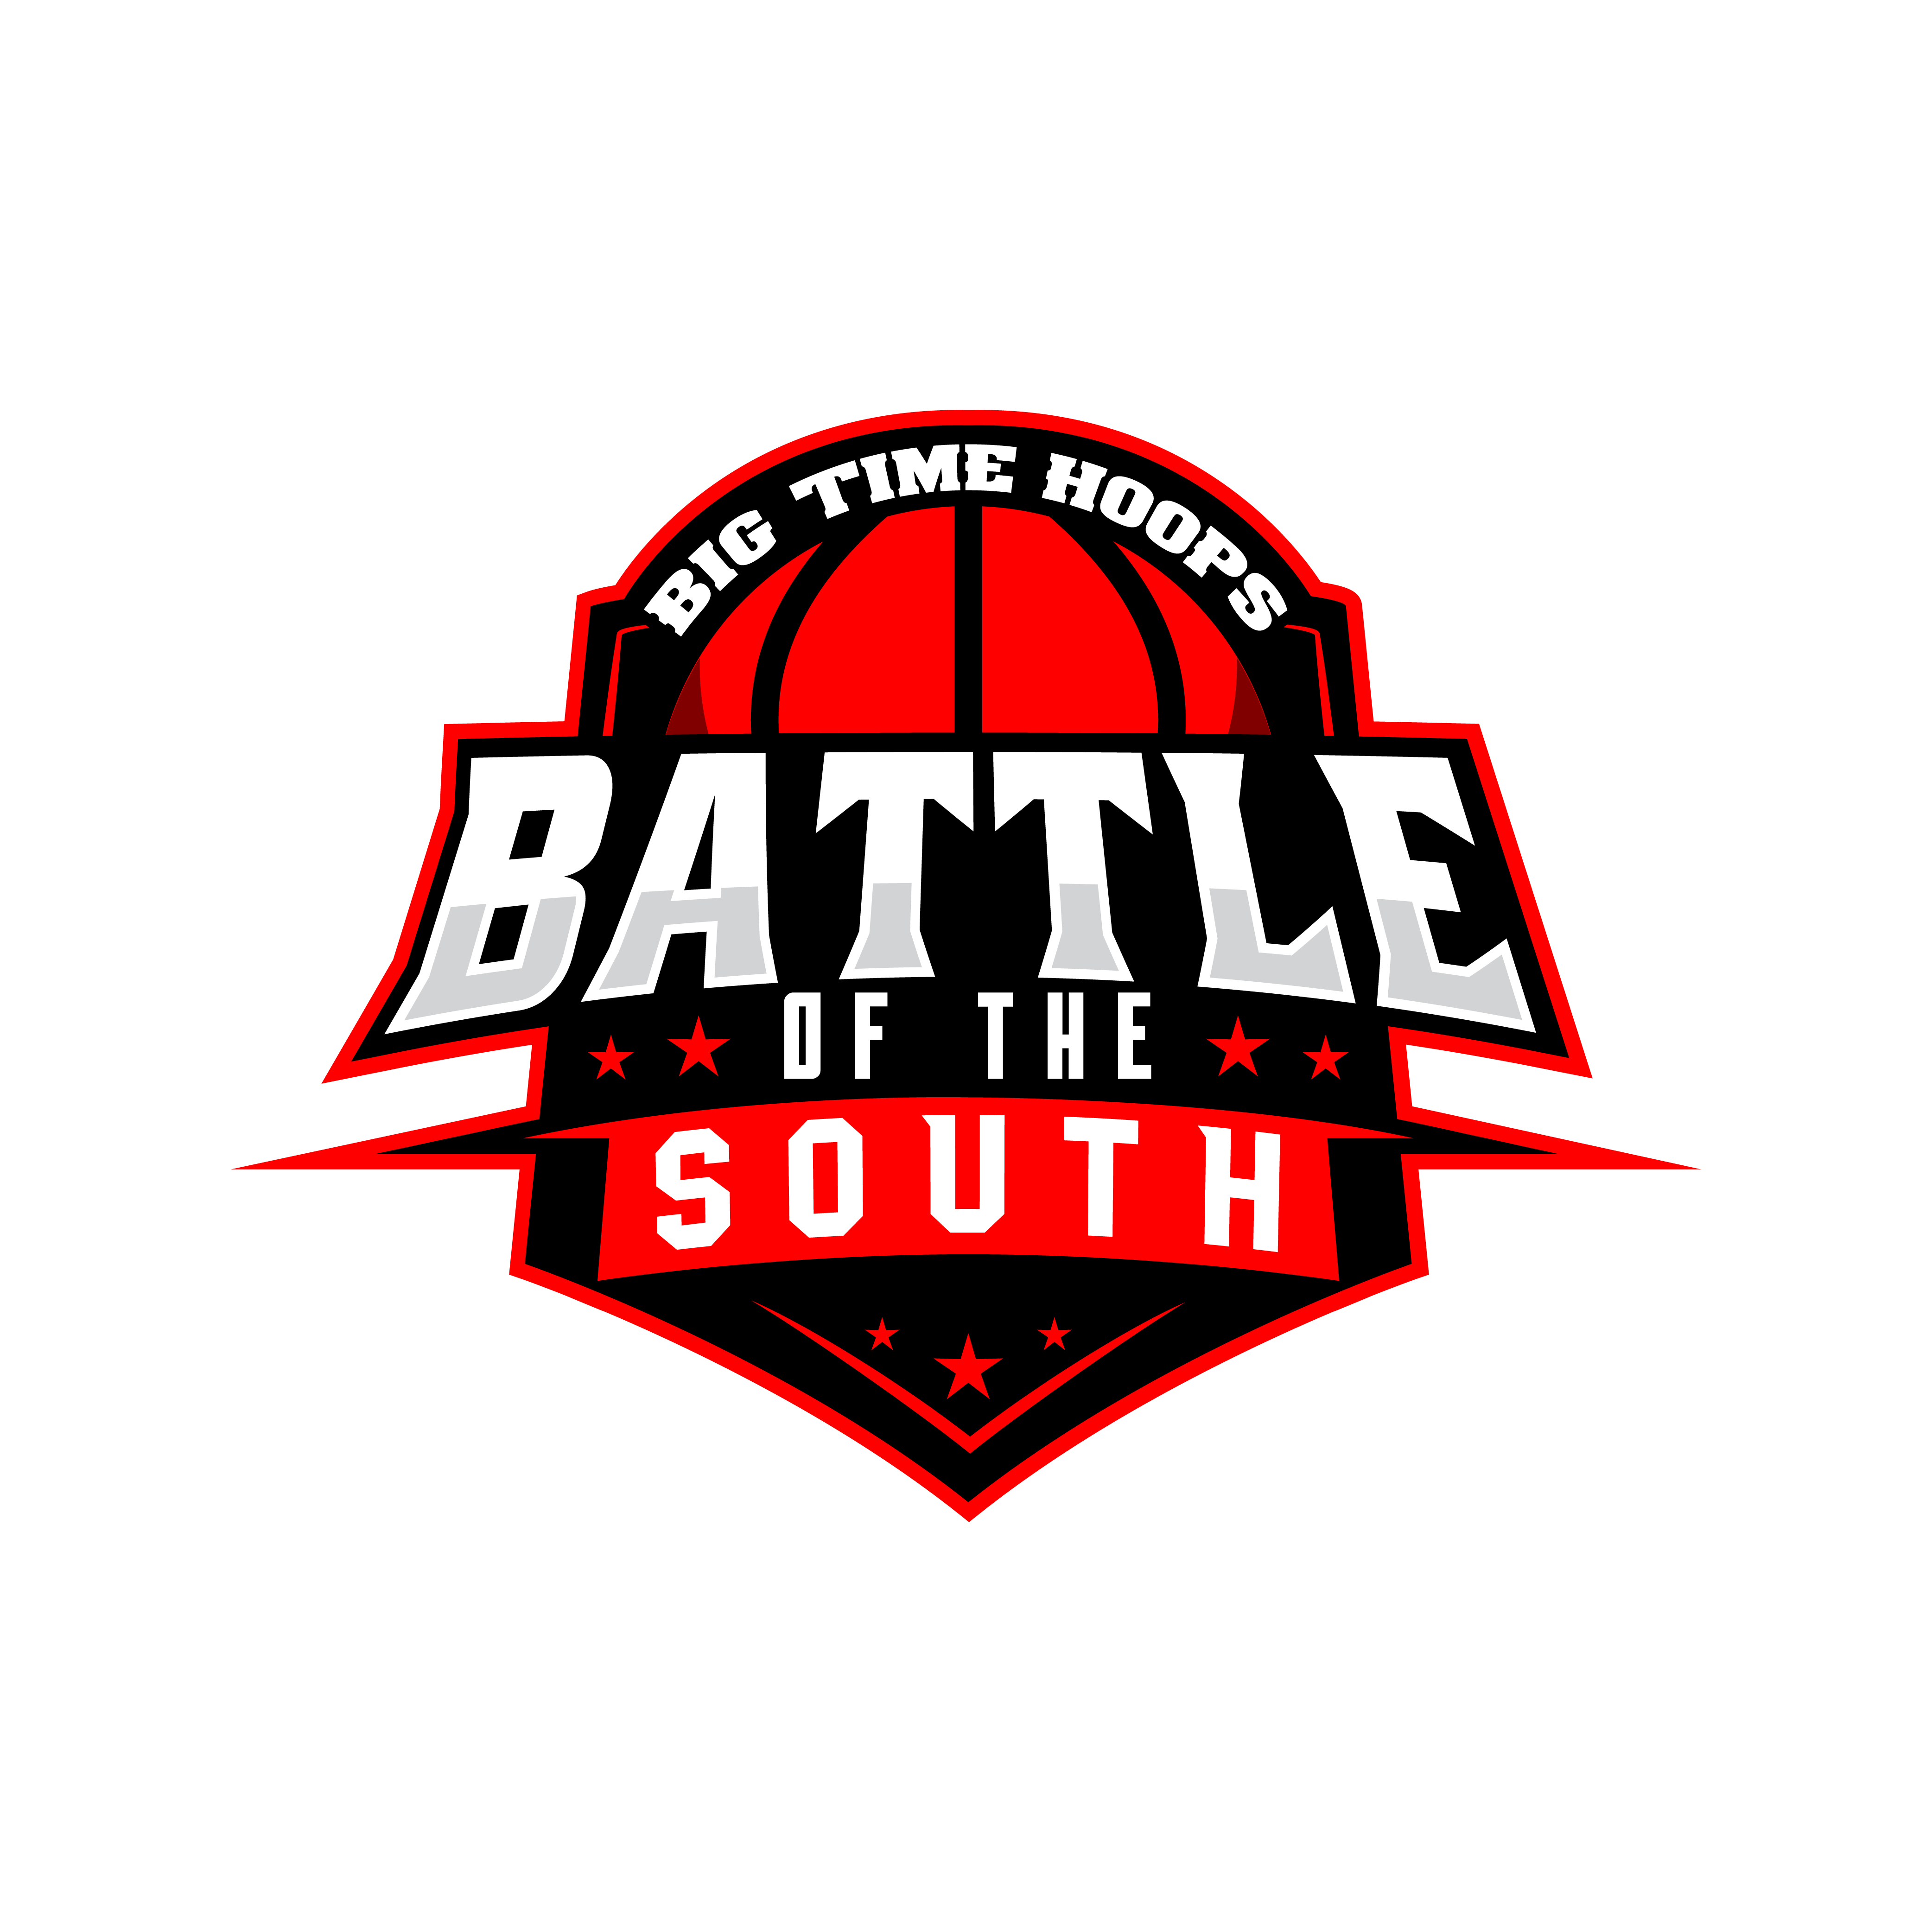 BATTLE OF THE SOUTH – SOUTH CAROLINA